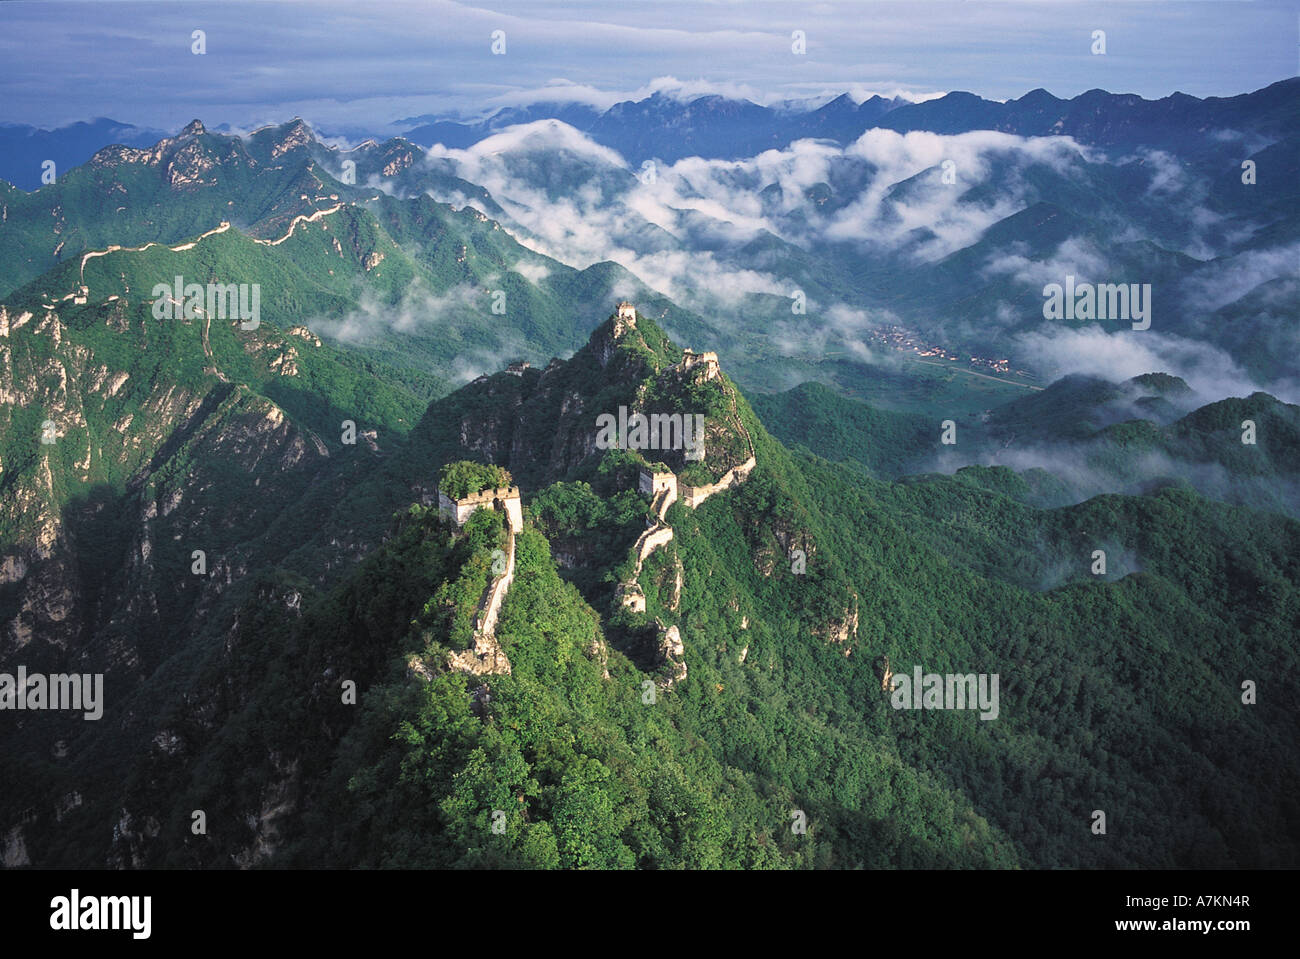 Great Wall,China - Stock Image